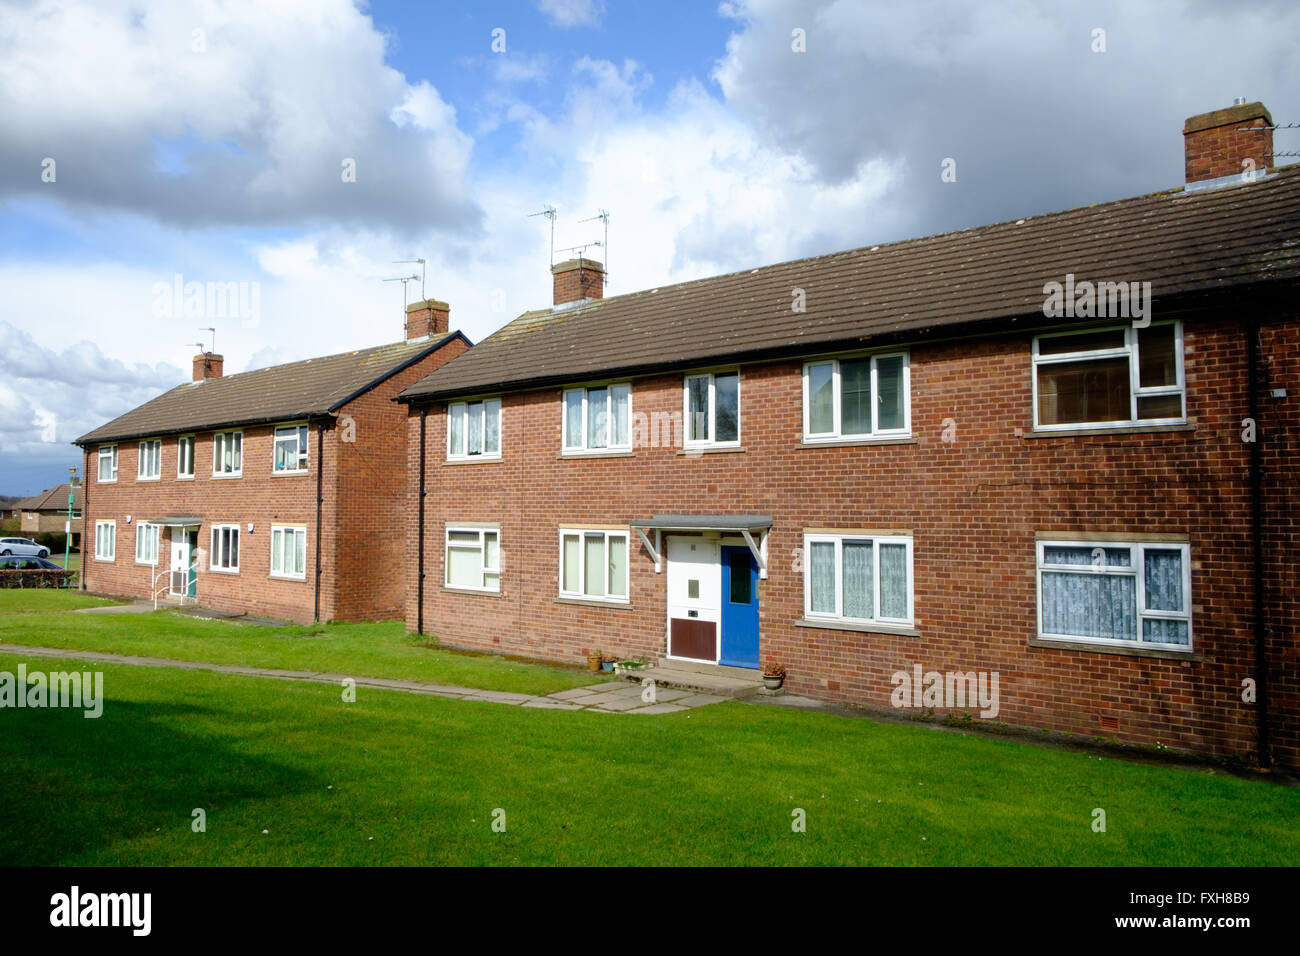 Social housing in Sheffield, UK - Stock Image